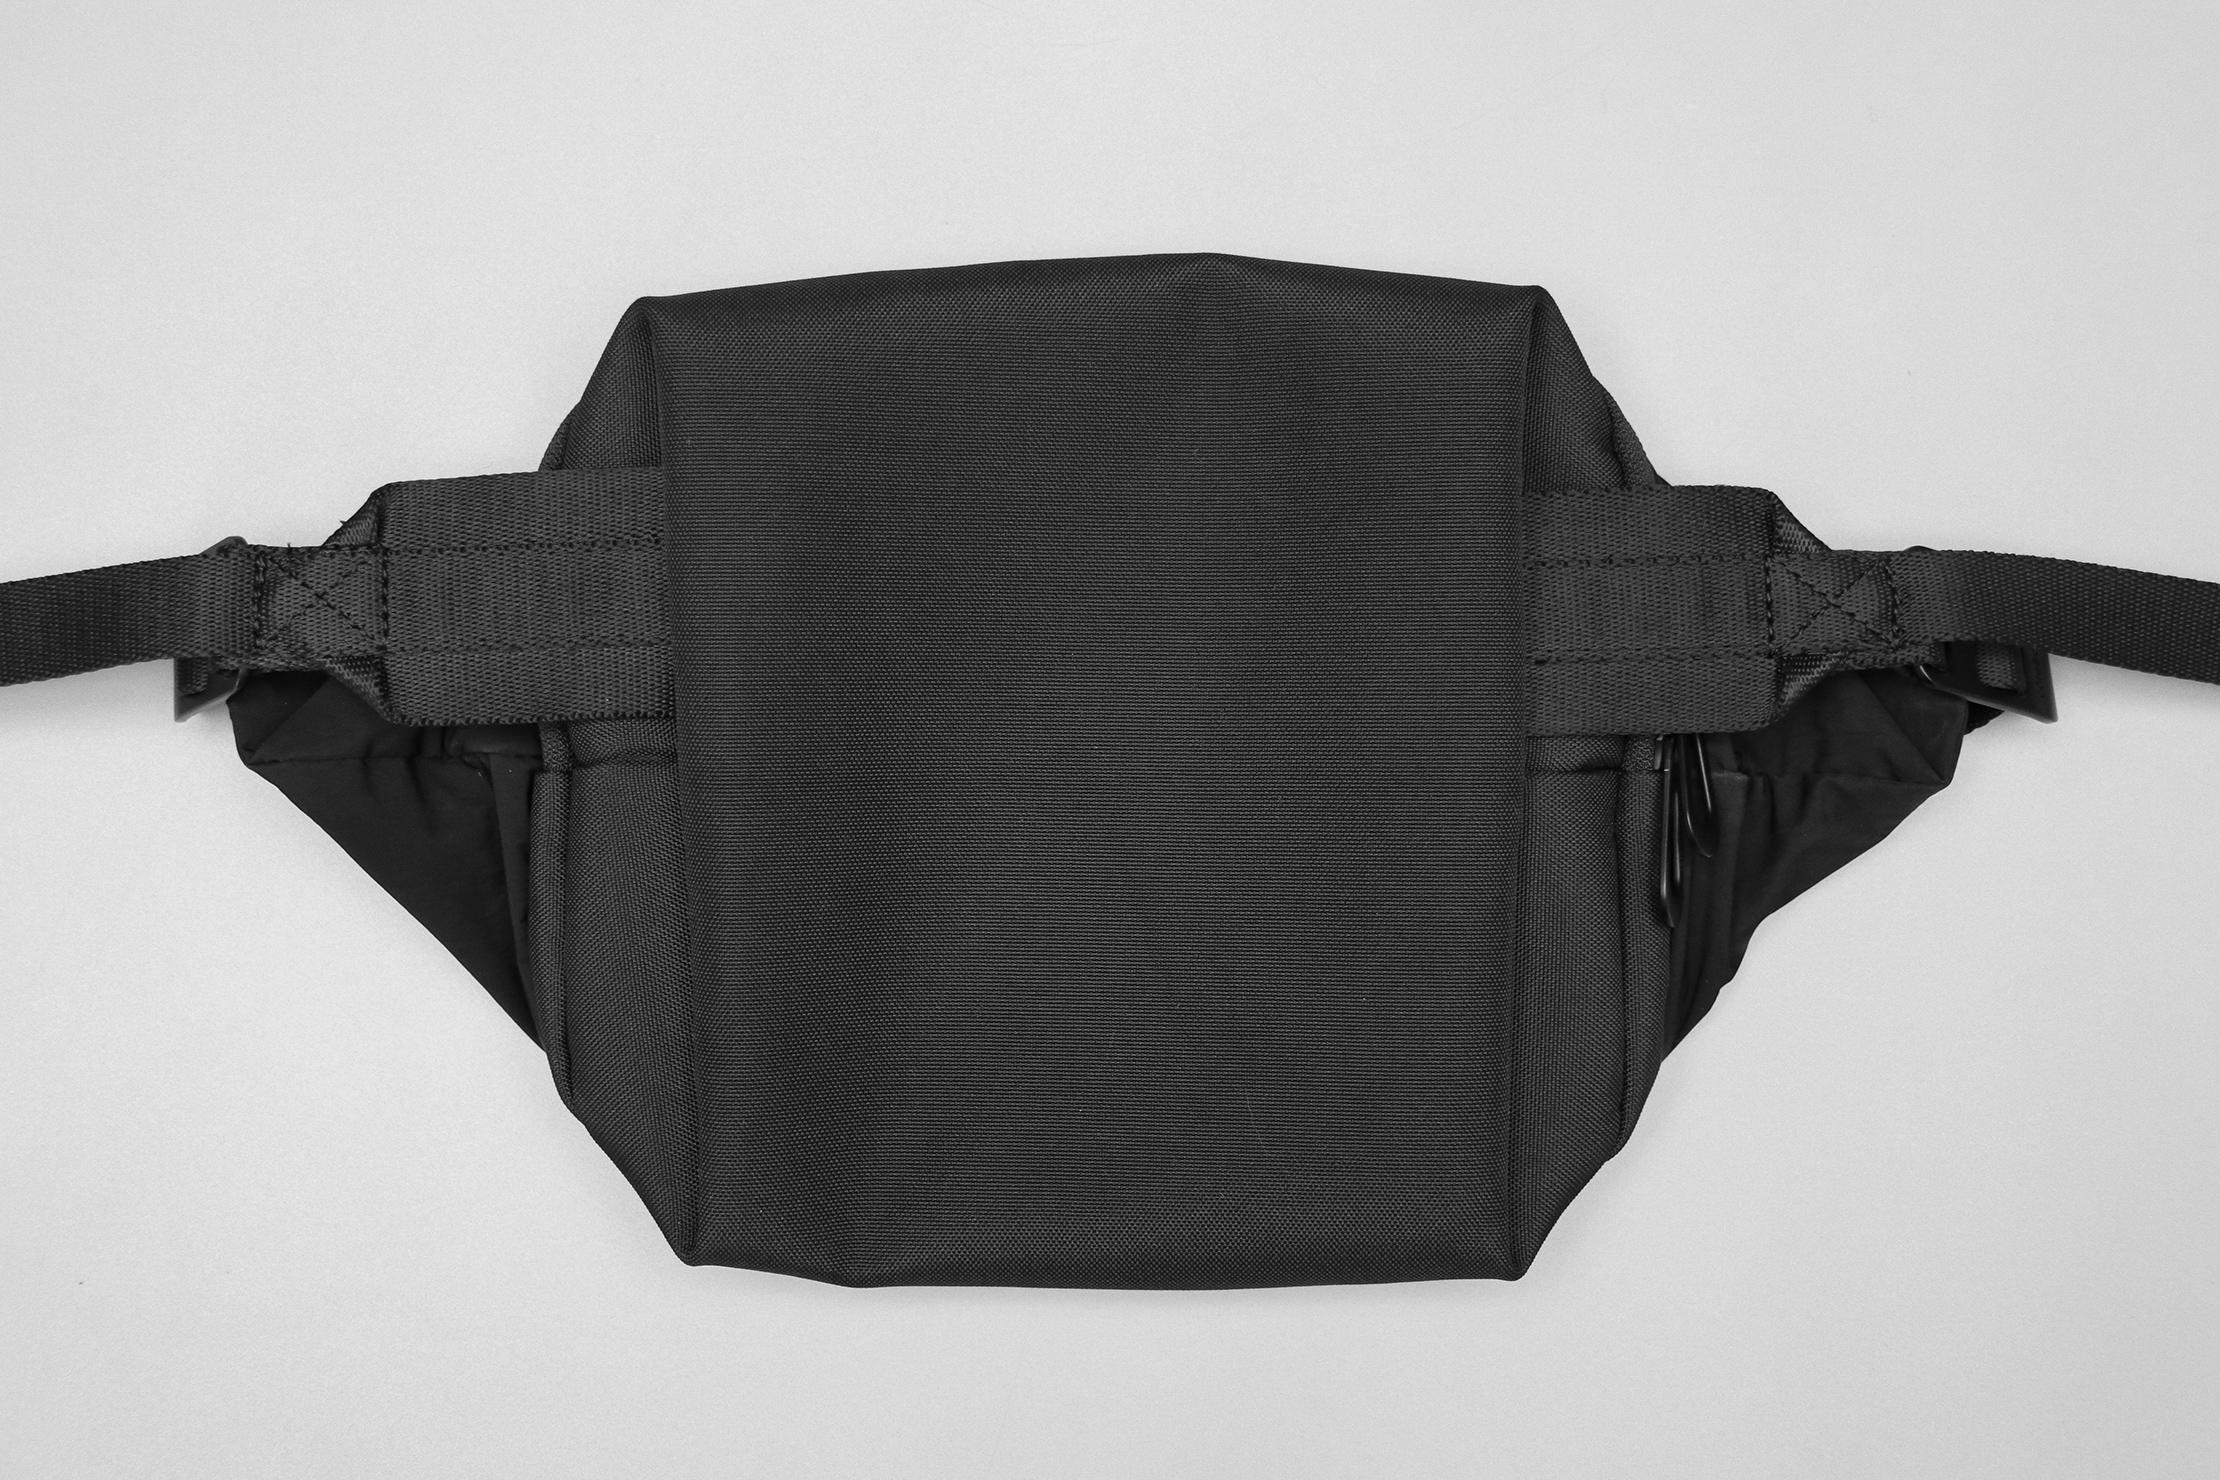 Côte&Ciel Isarau Small Back Fabric